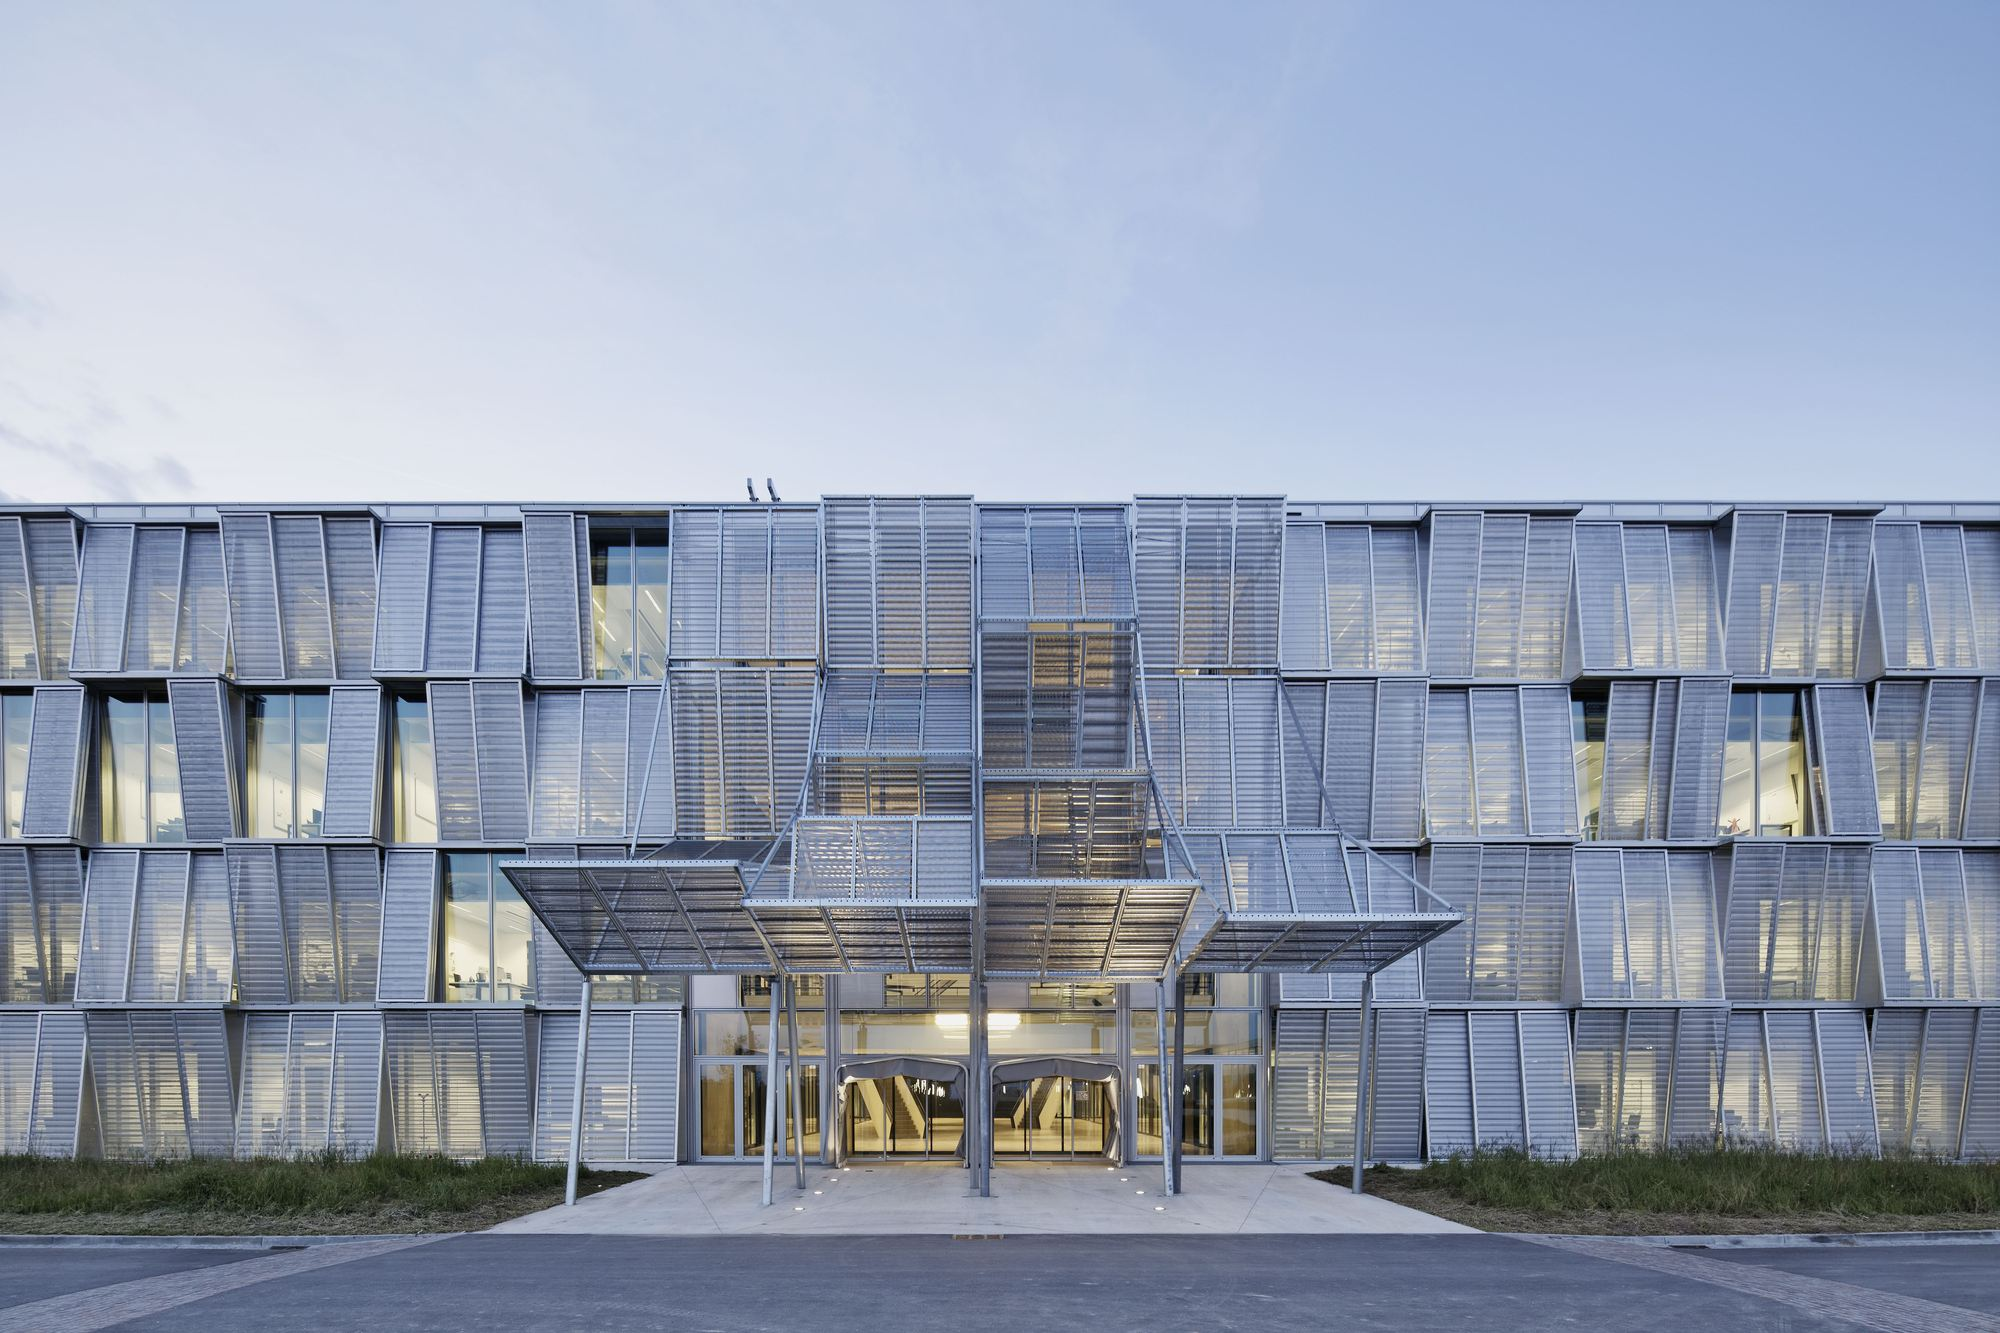 New mechanics hall me building dominique perrault for Architecture suisse